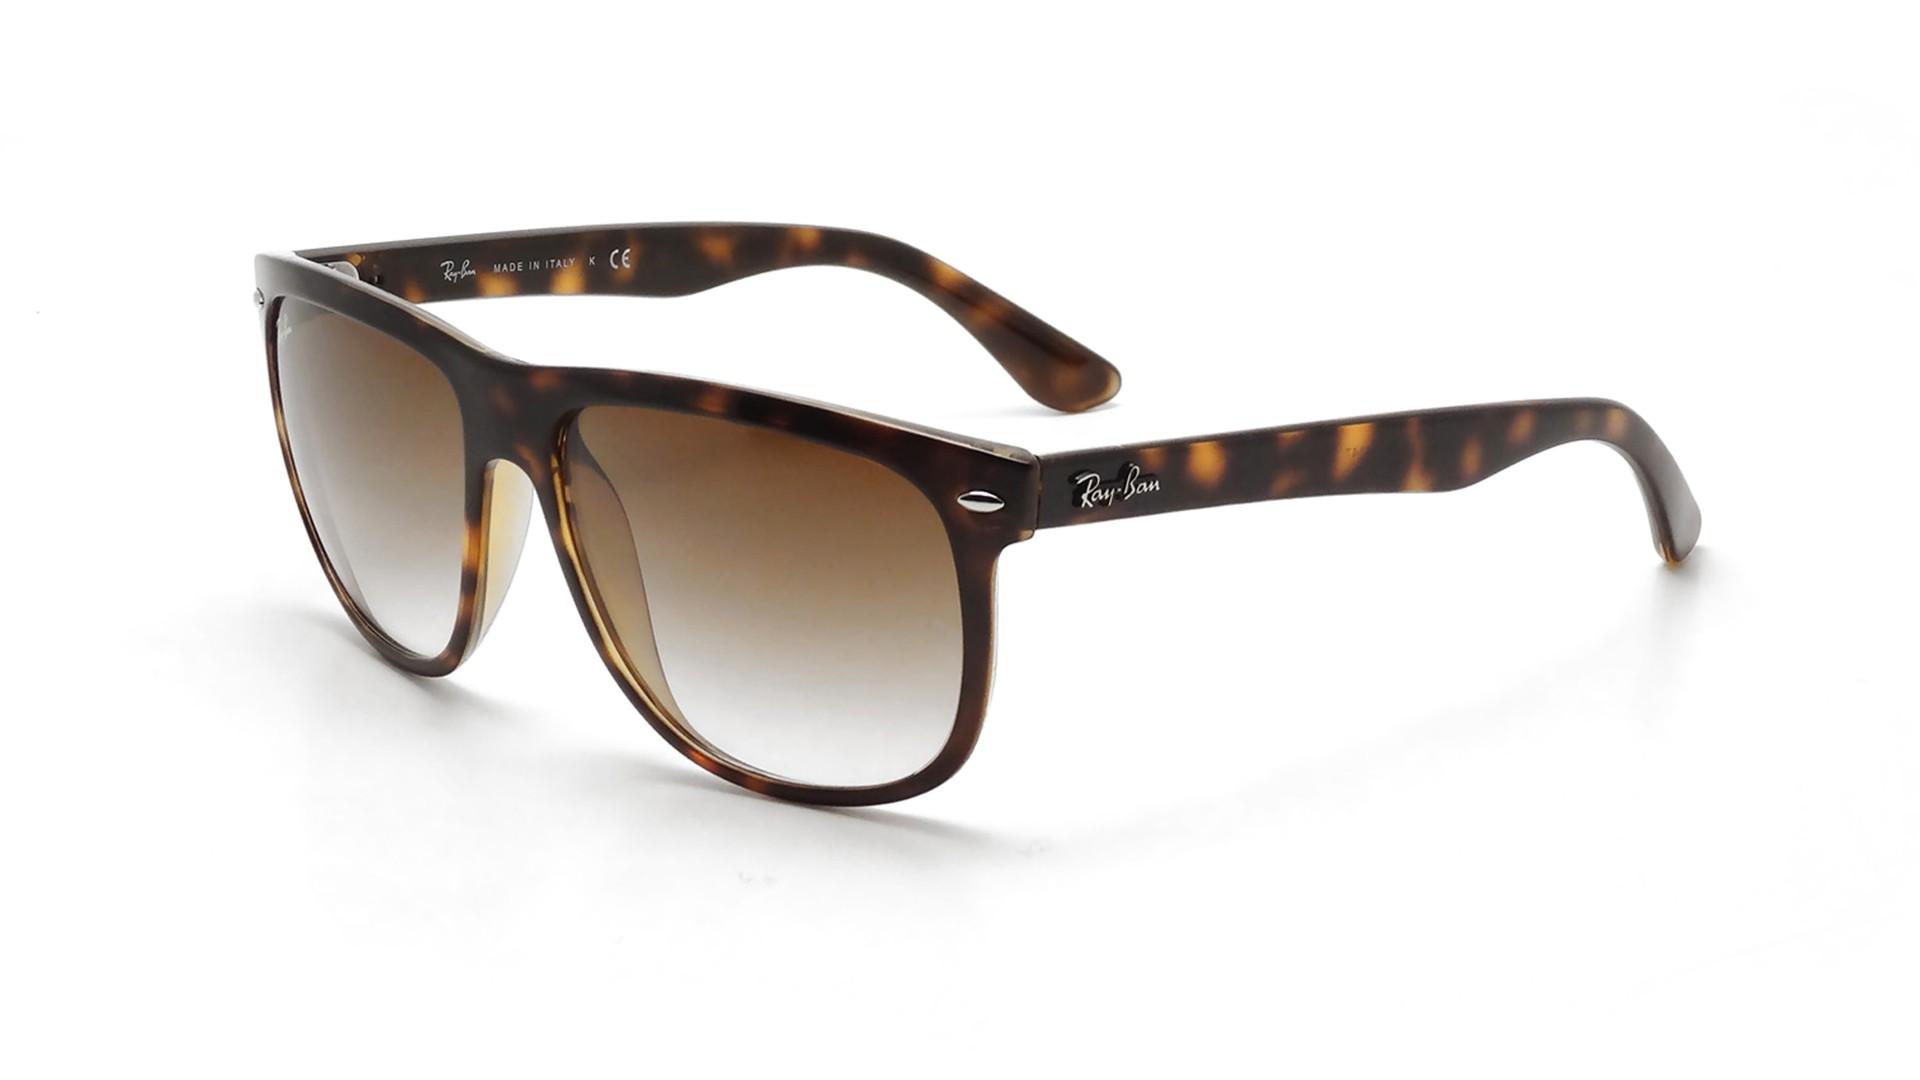 0f7b2c67a97 Sunglasses Ray-Ban RB4147 710 51 56-15 Tortoise Medium Gradient